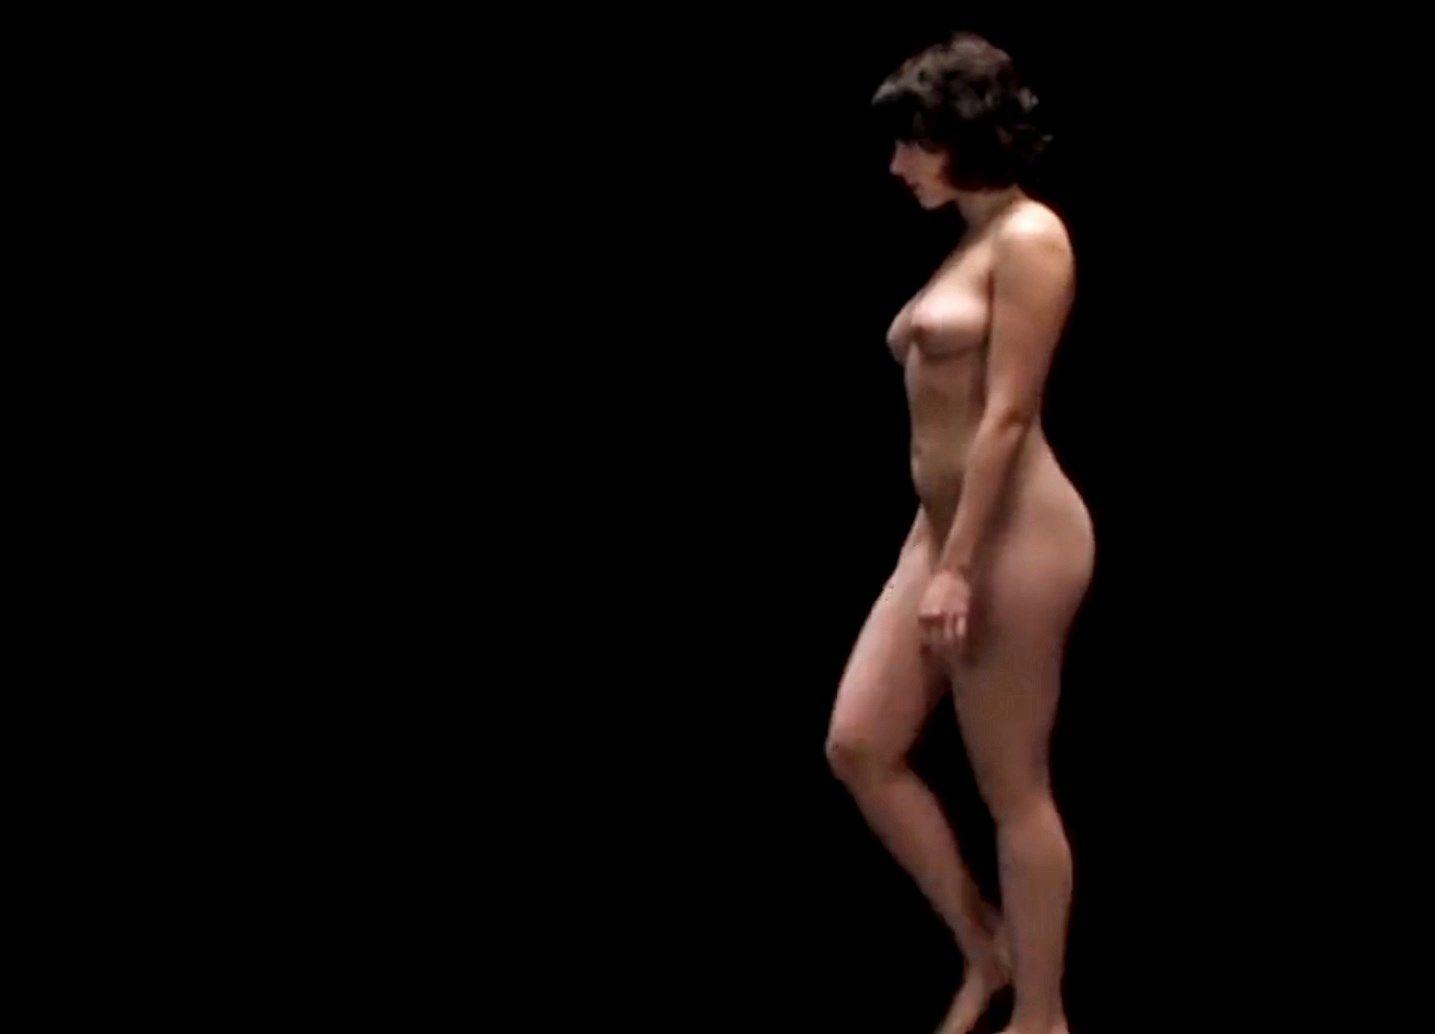 Scarlett johansson naked movies, beautiful nude indian models